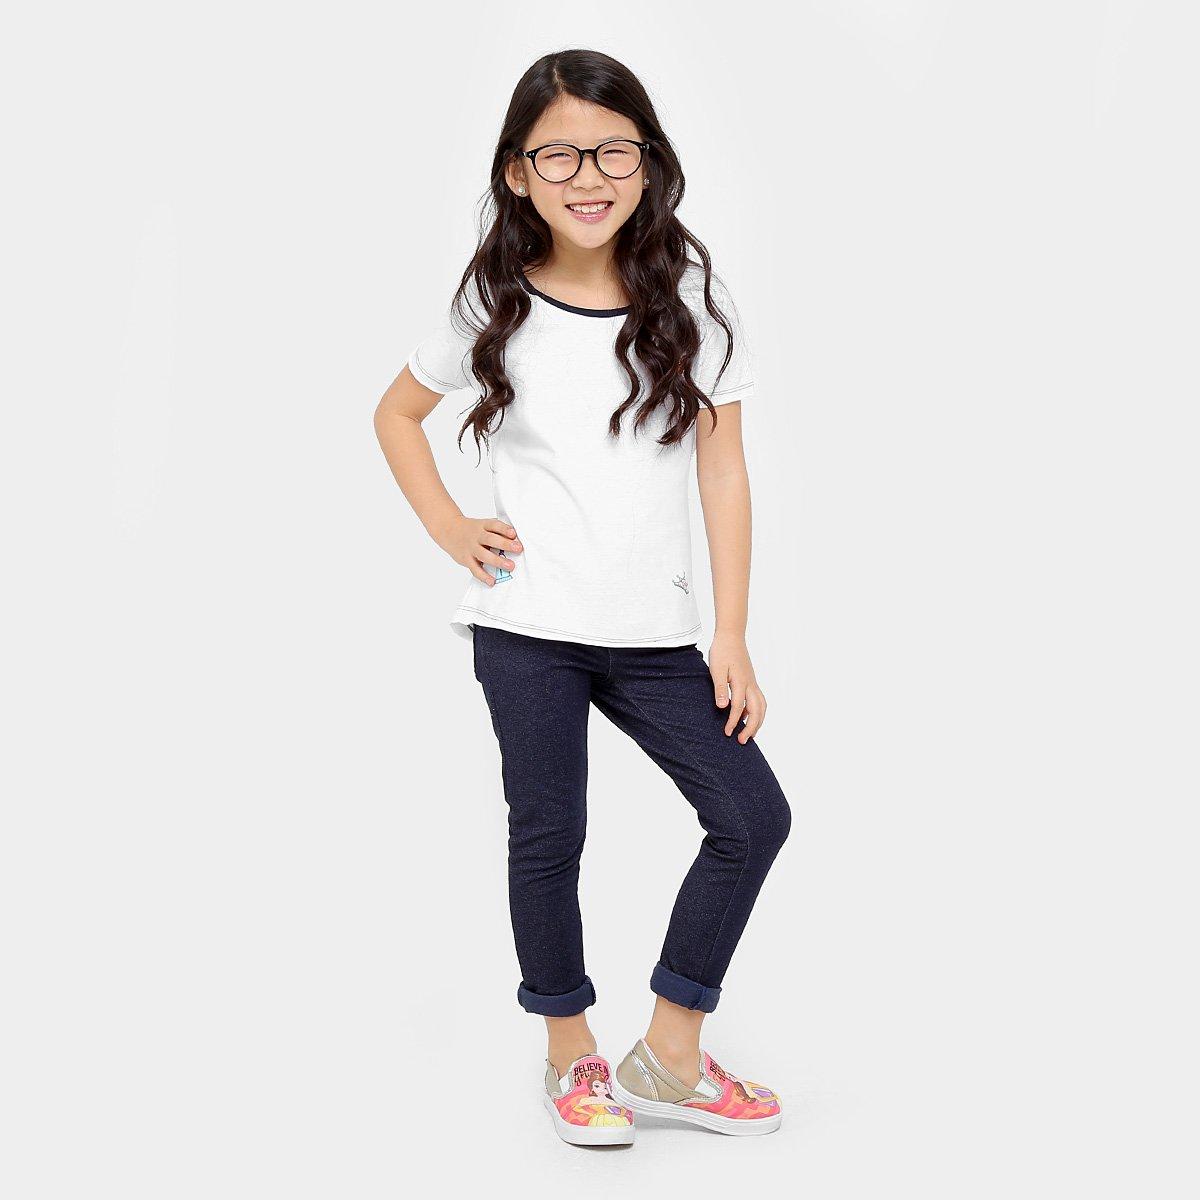 Branco Disney Botons Bela Camiseta Disney Bela Infantil Camiseta tOqw7x0